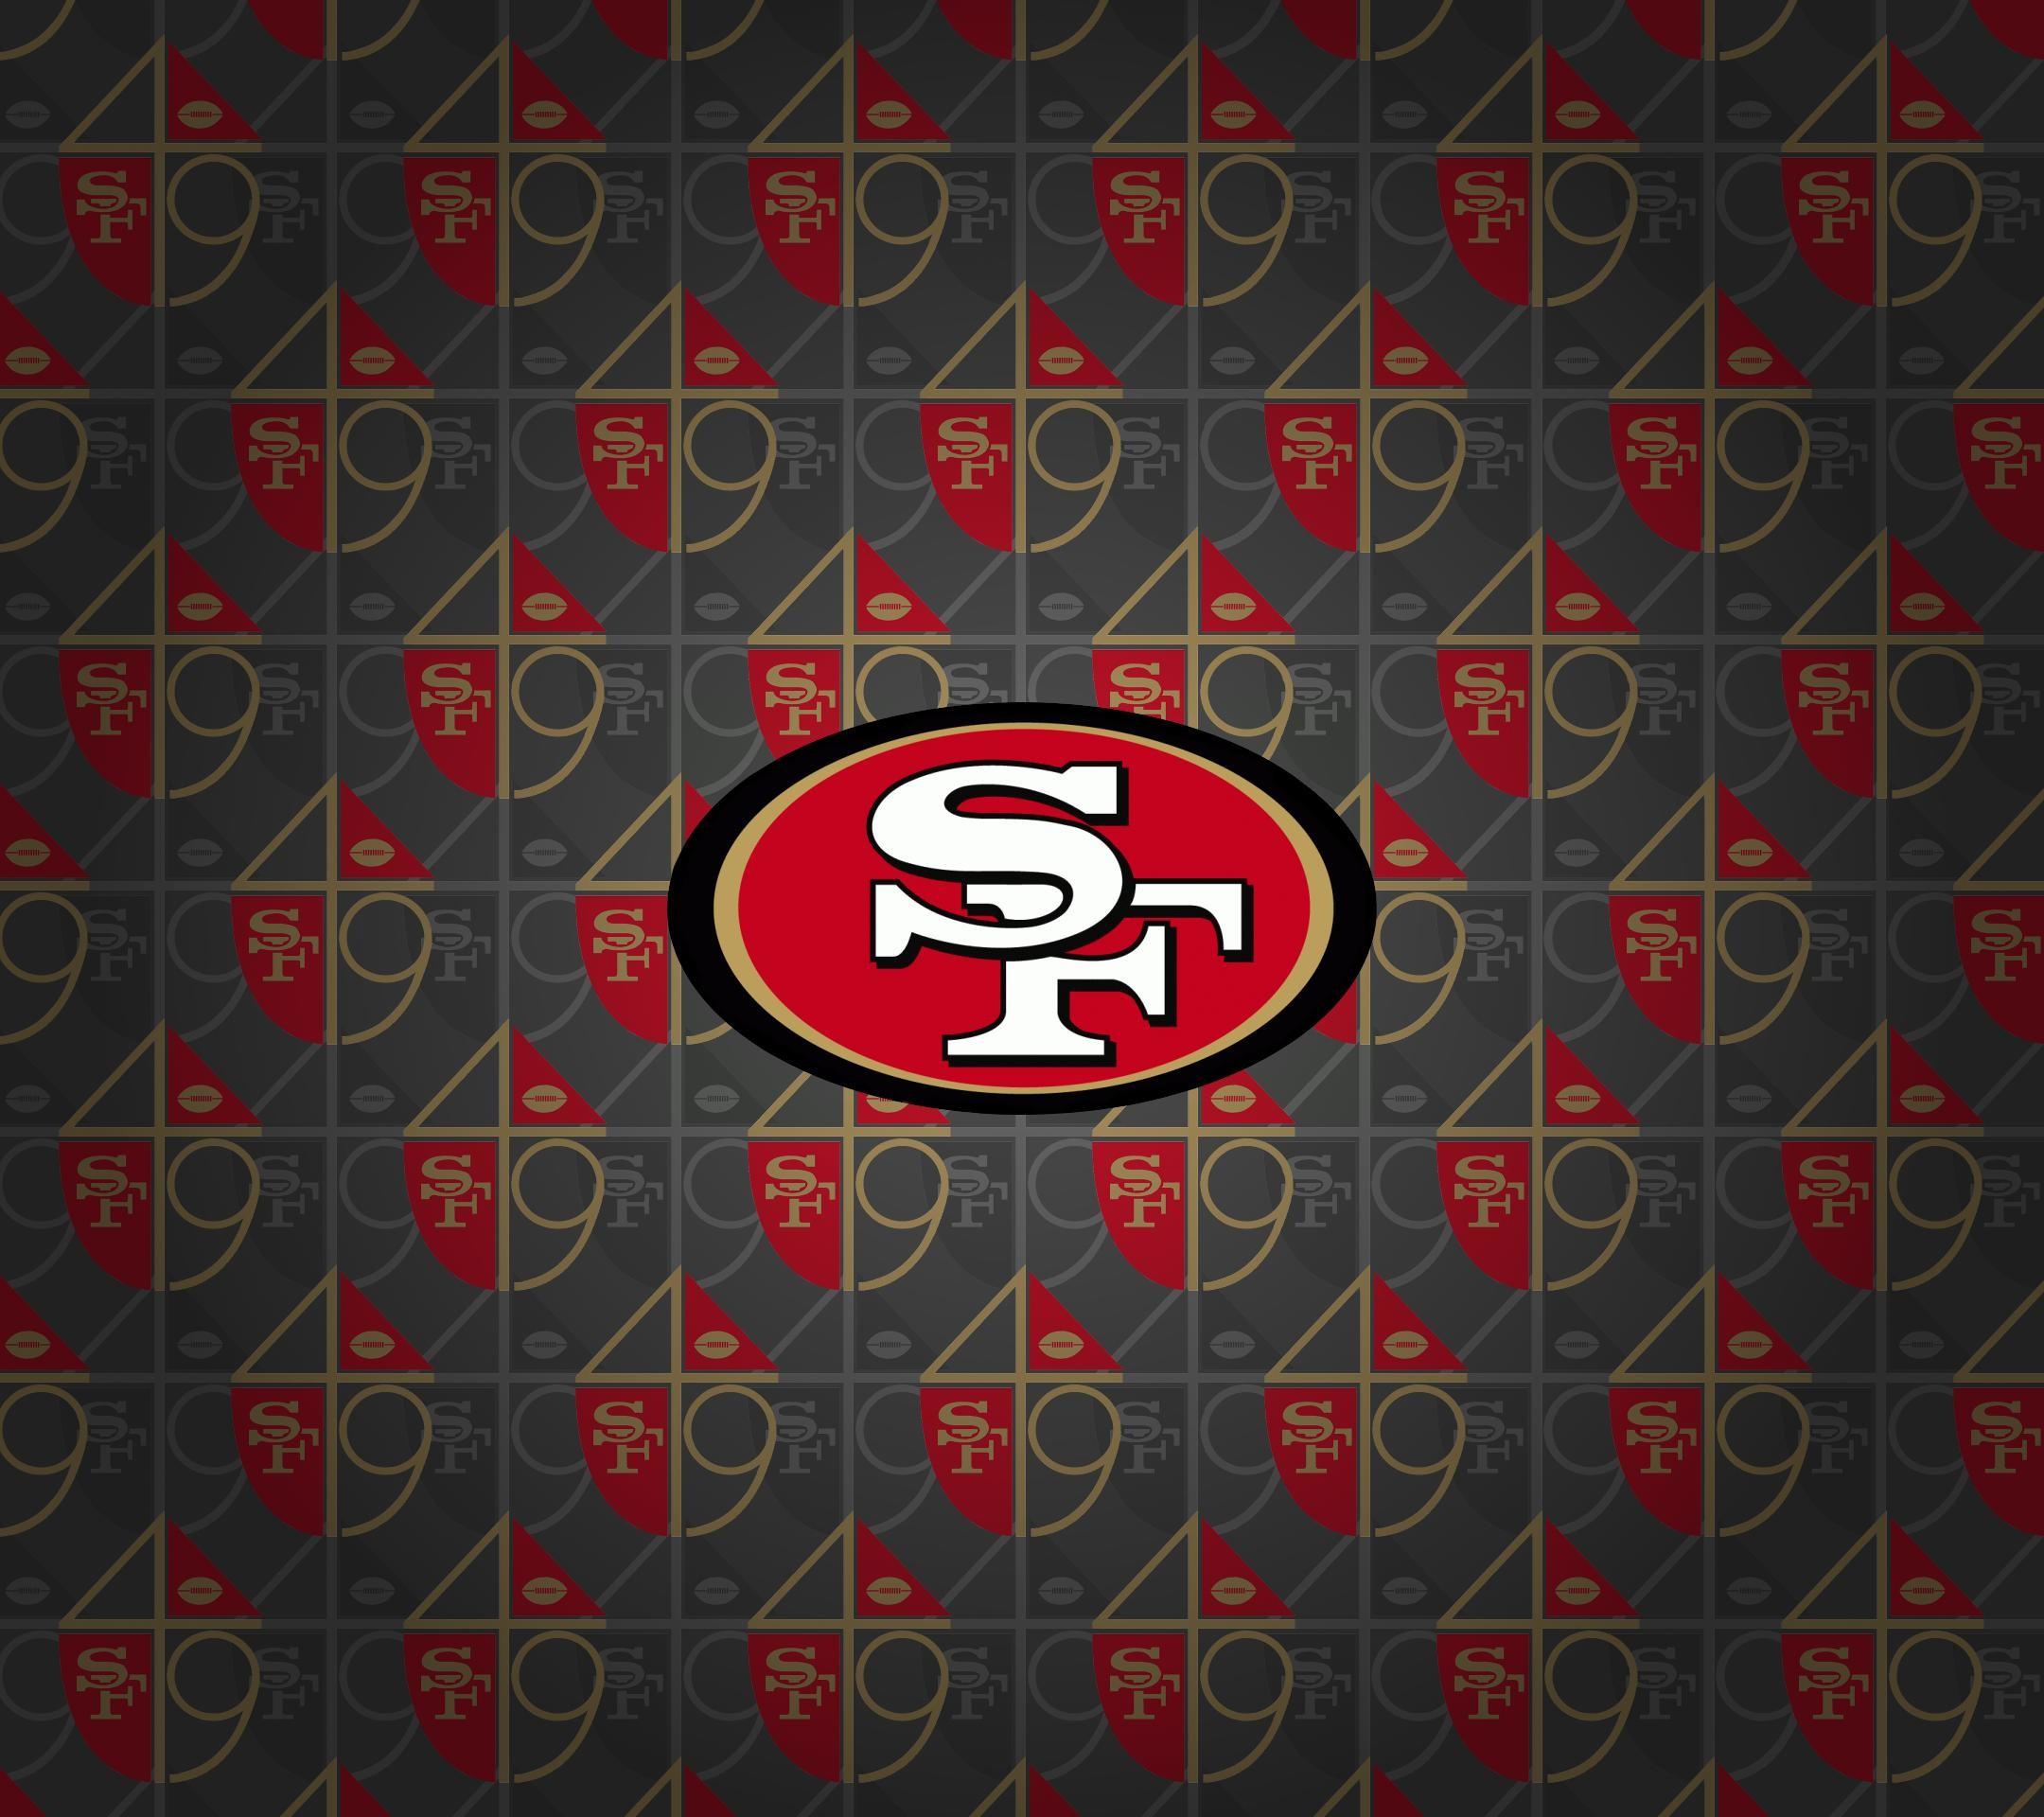 San Francisco 49ers Logo HD Wallpaper.